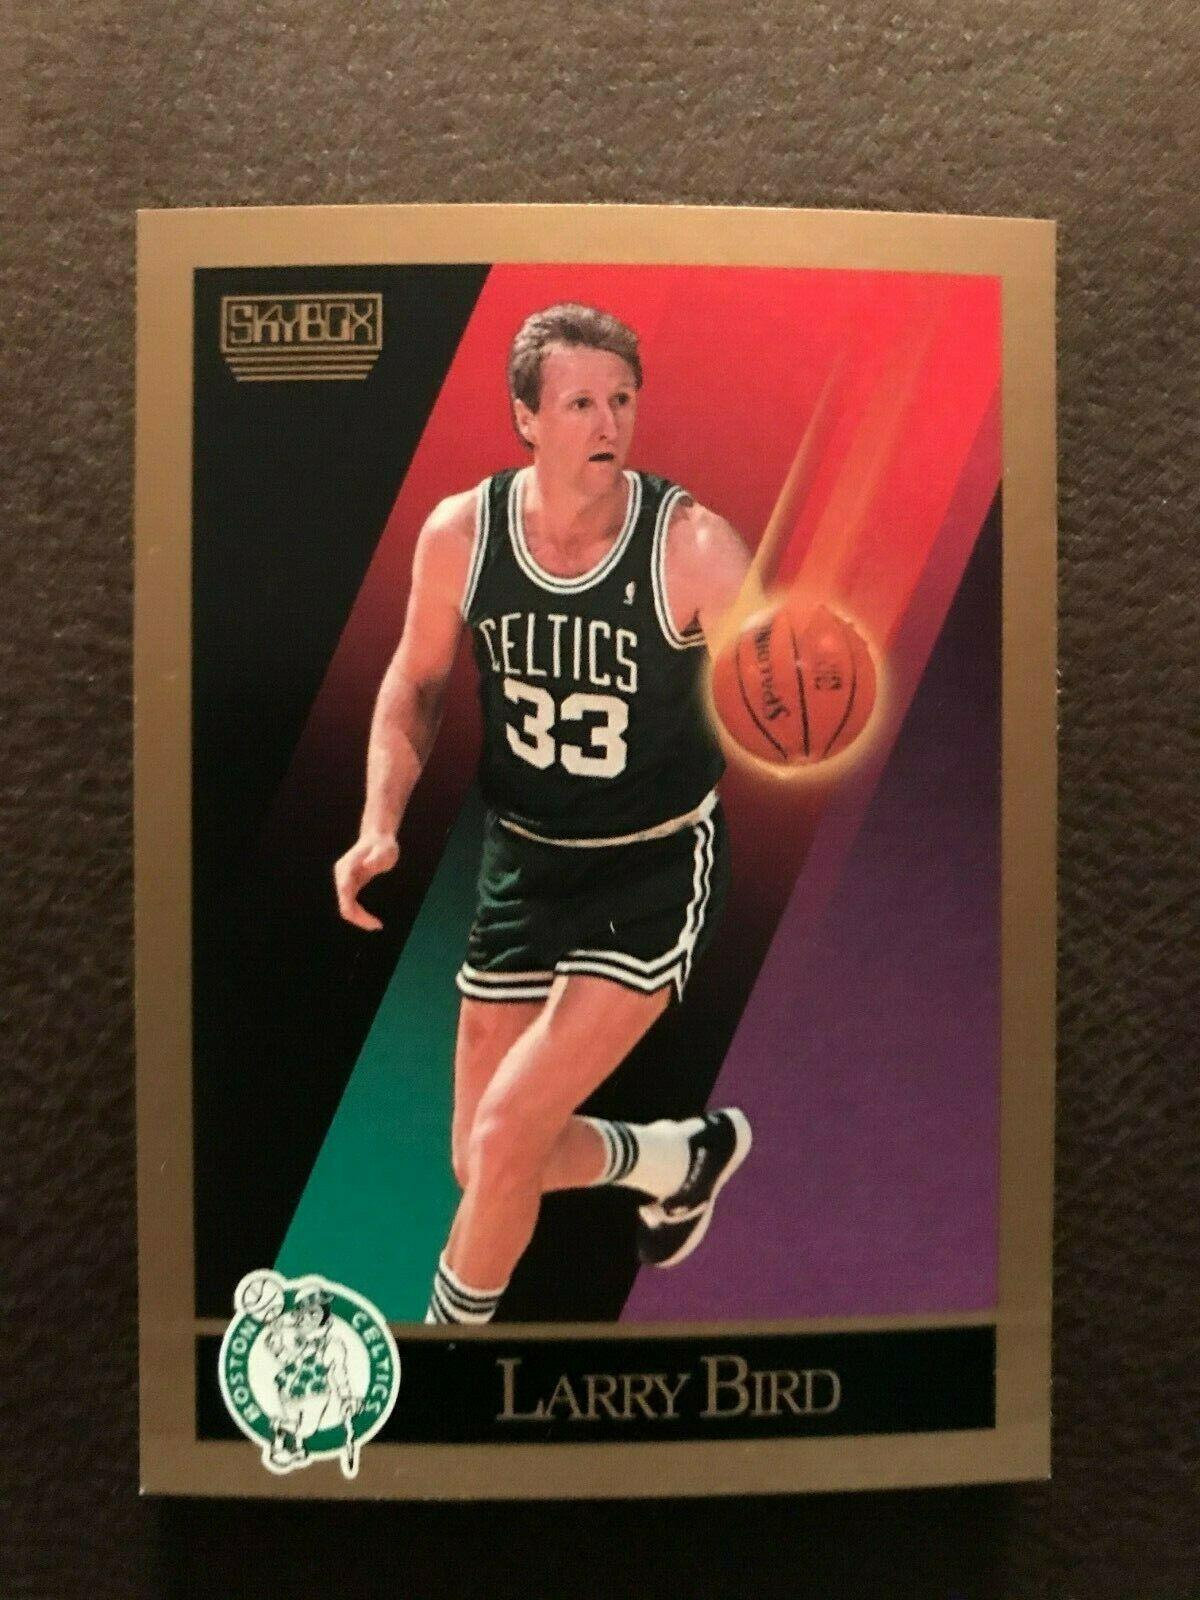 1990 SkyBox Larry Bird Card #14 SkyBox Very First Cards